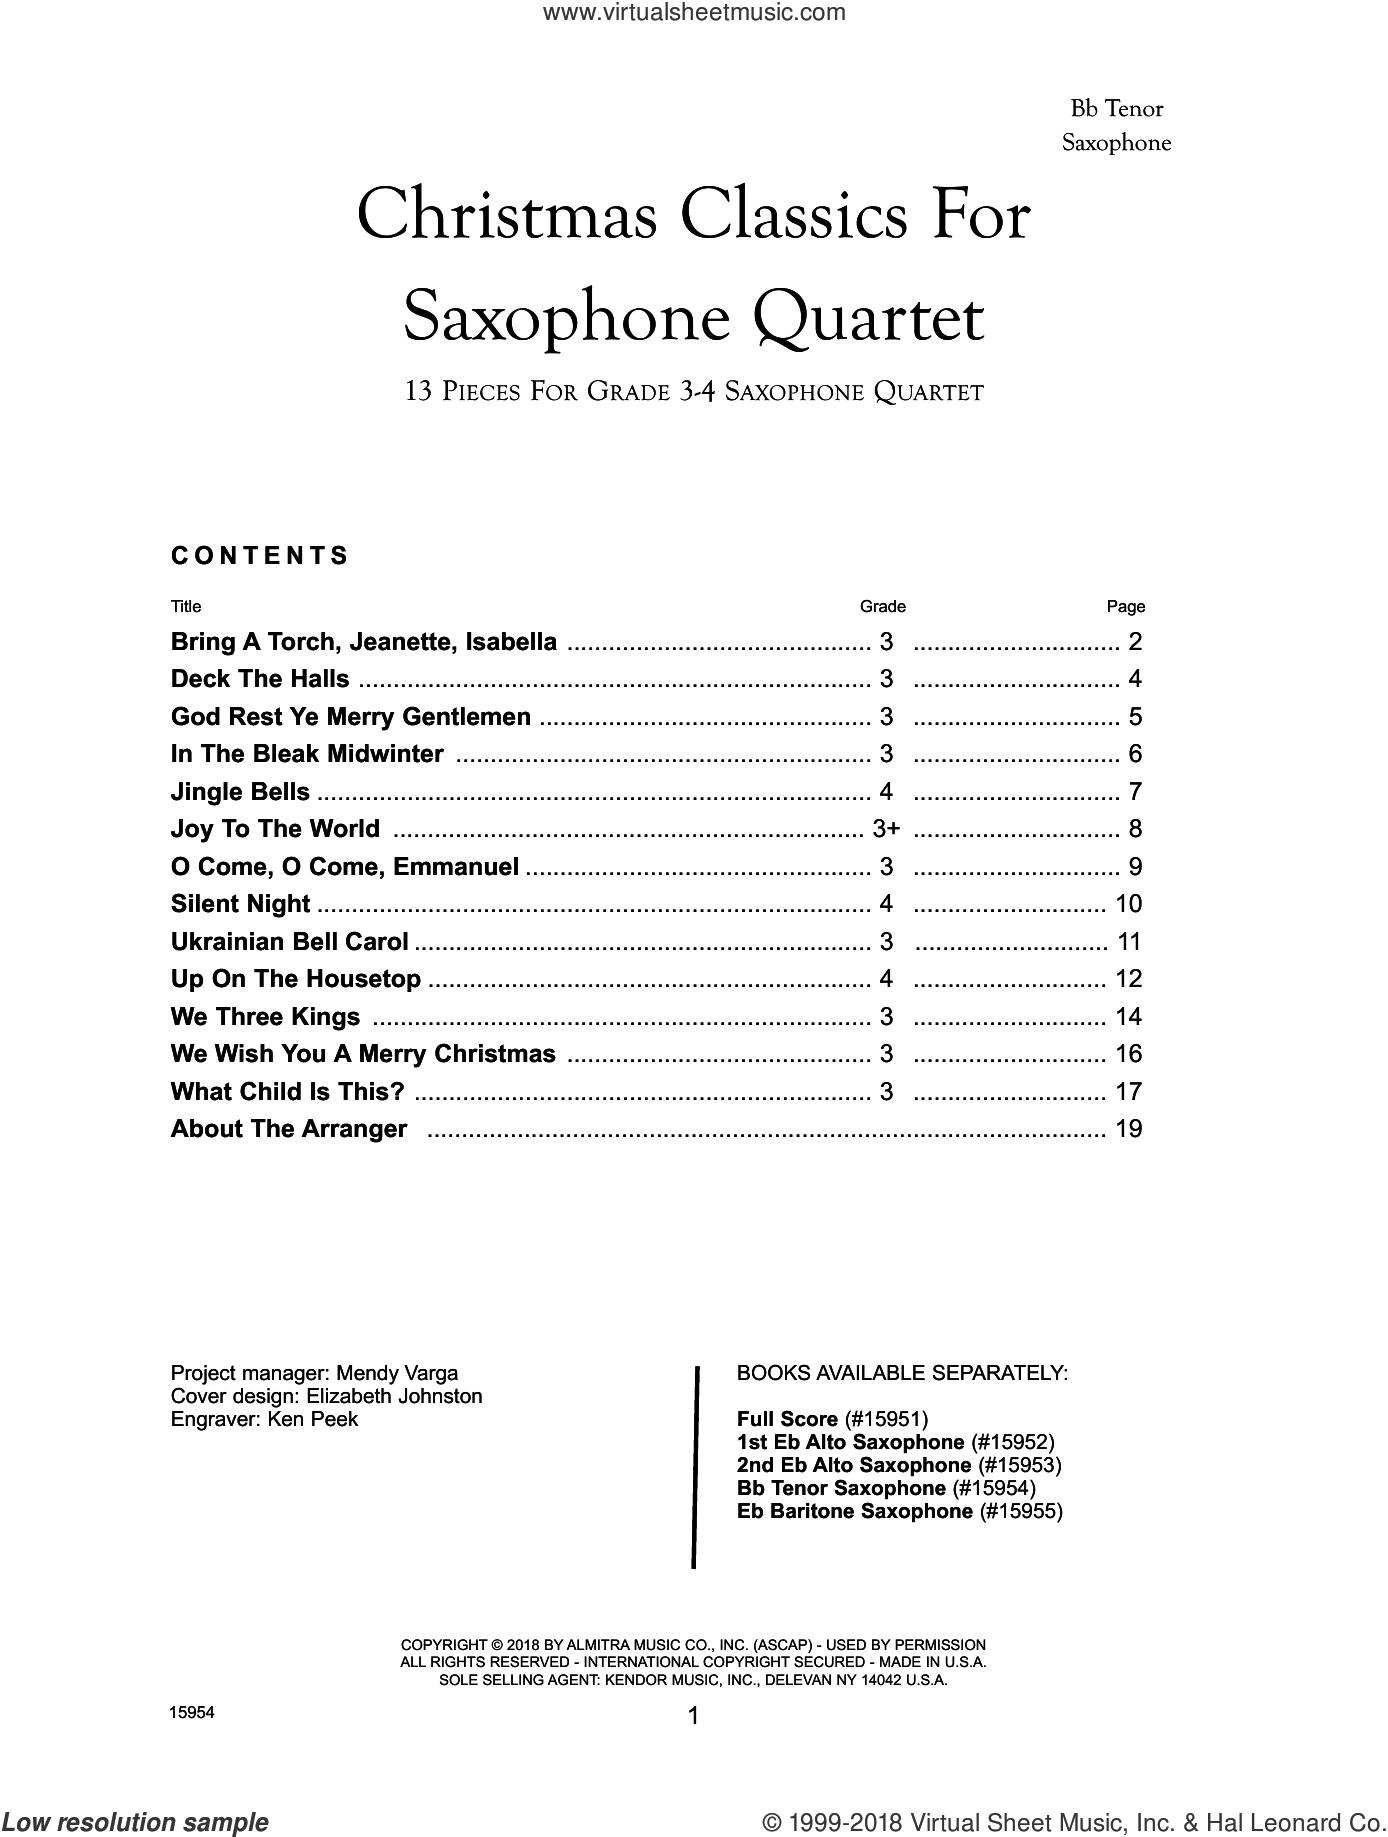 Christmas Classics For Saxophone Quartet - Bb Tenor Saxophone sheet music for saxophone quartet by Frank J. Halferty, intermediate skill level